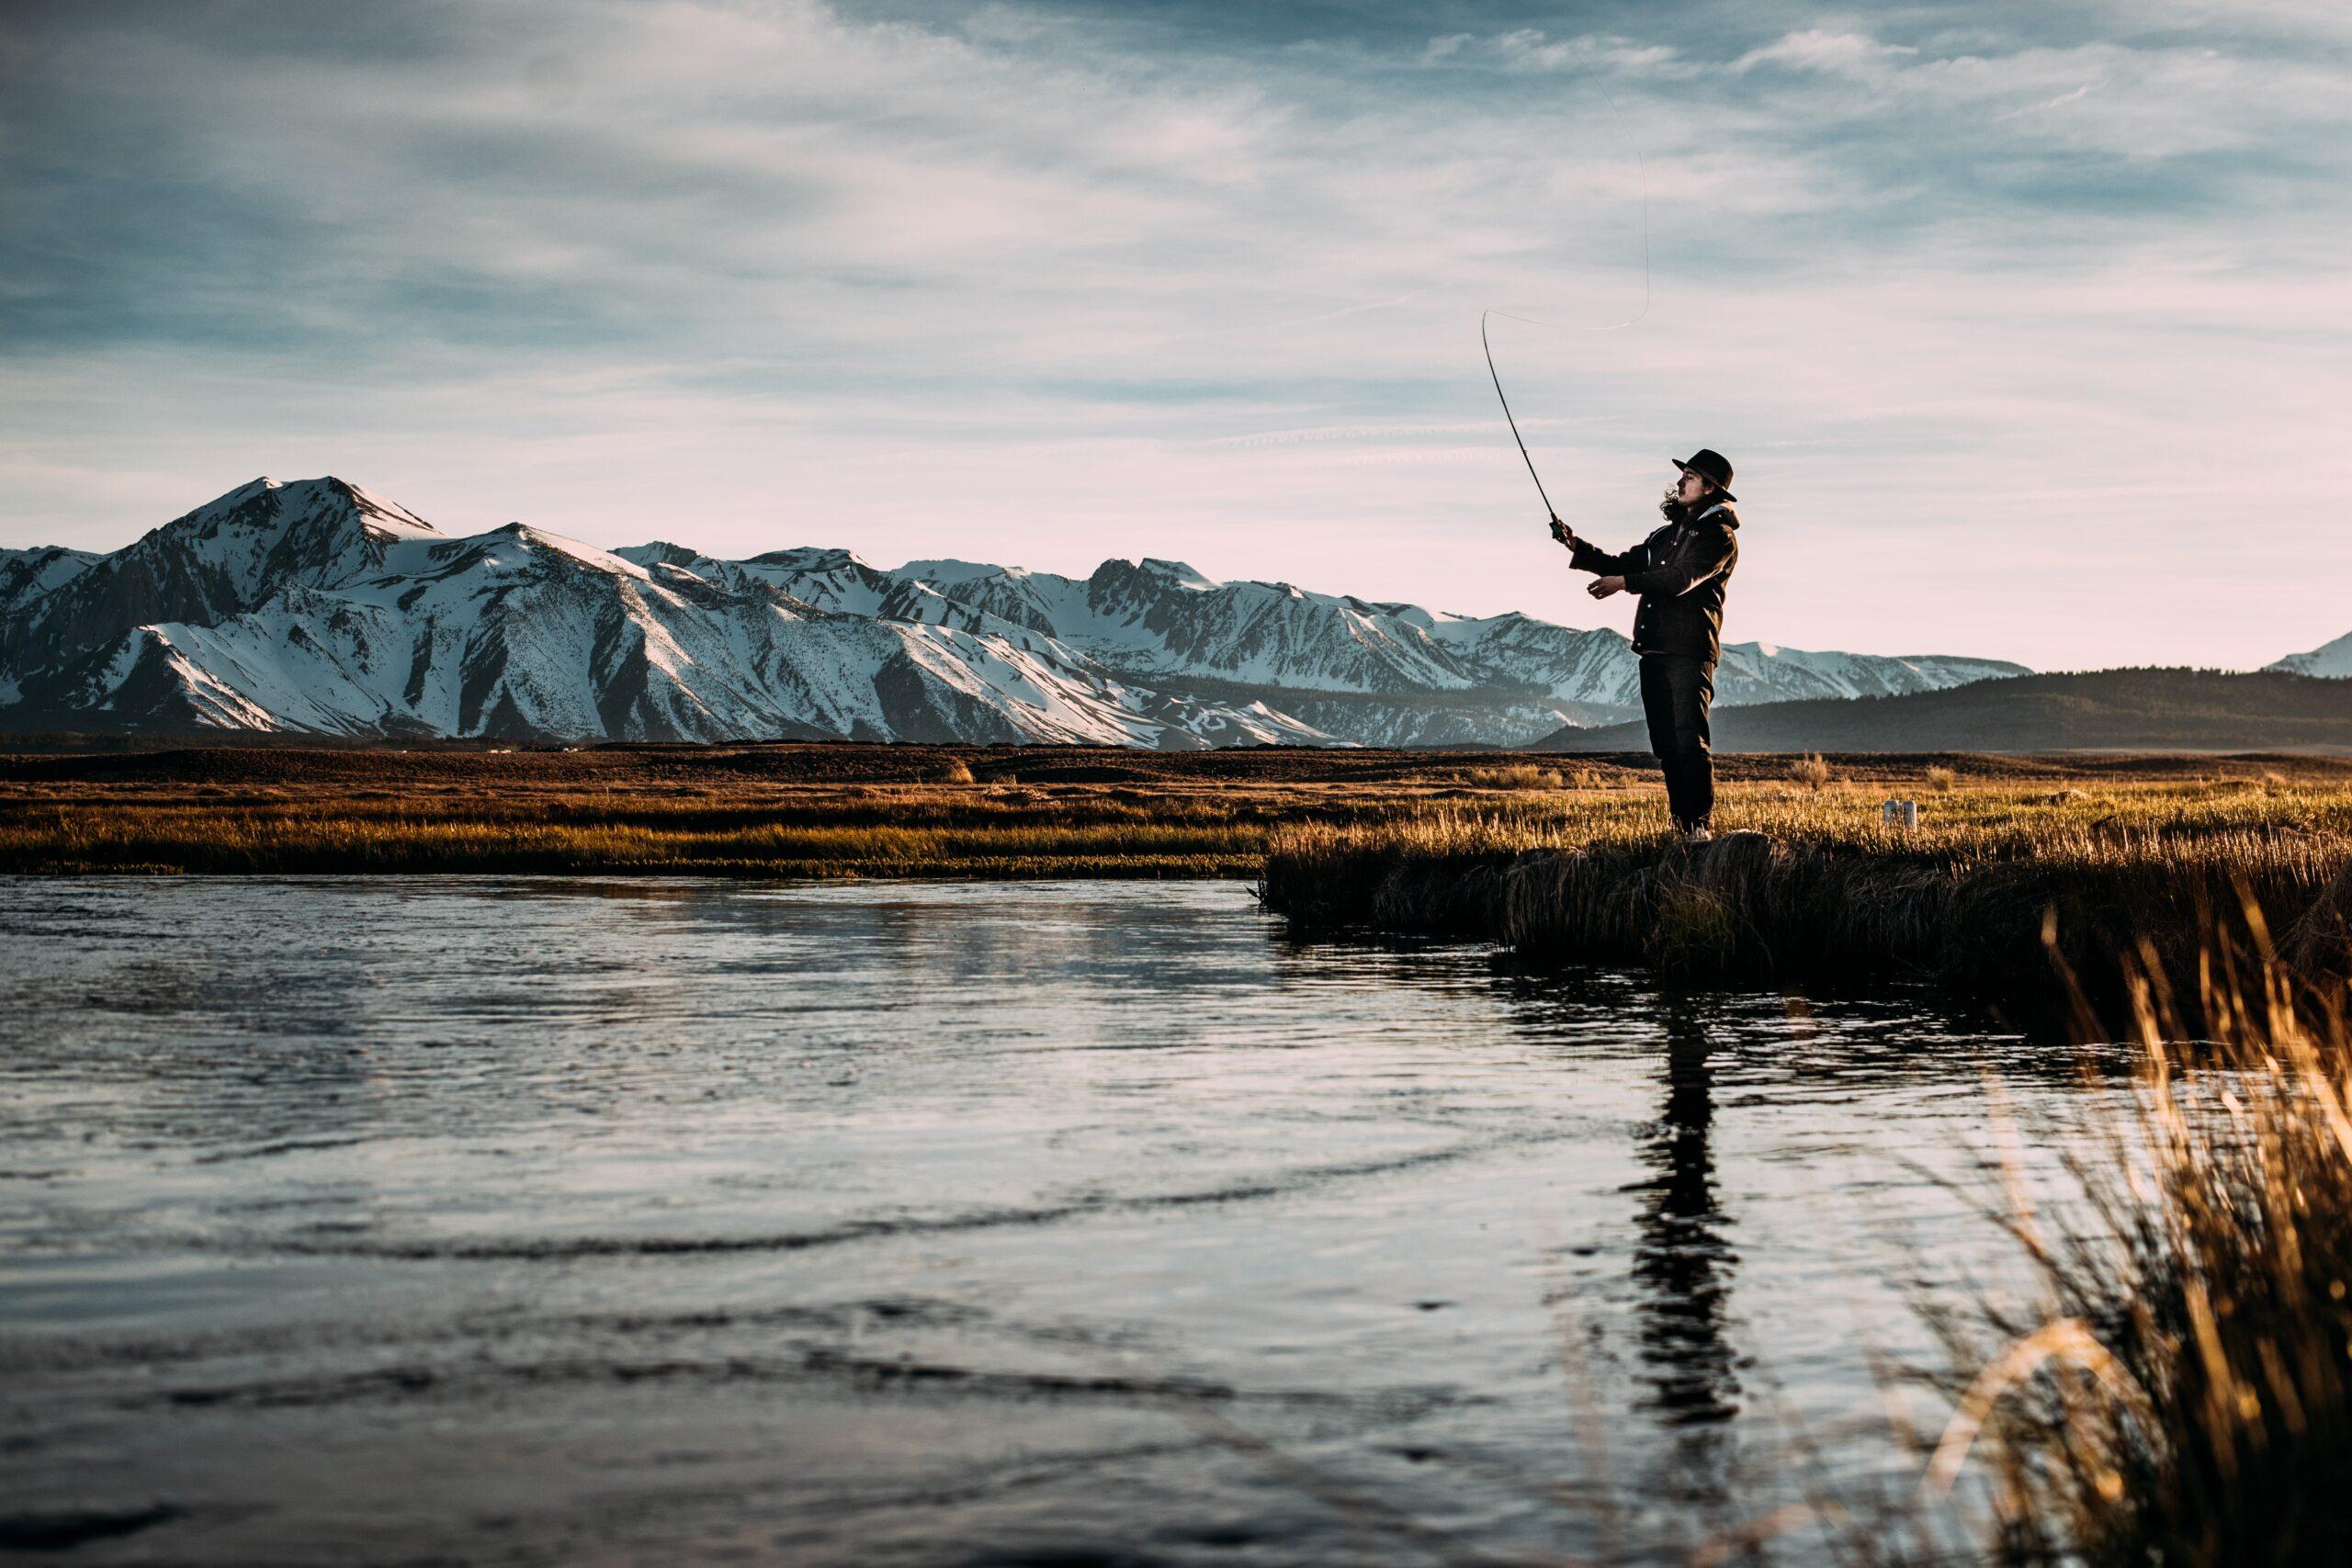 landpass bowfishing vs bass fishing